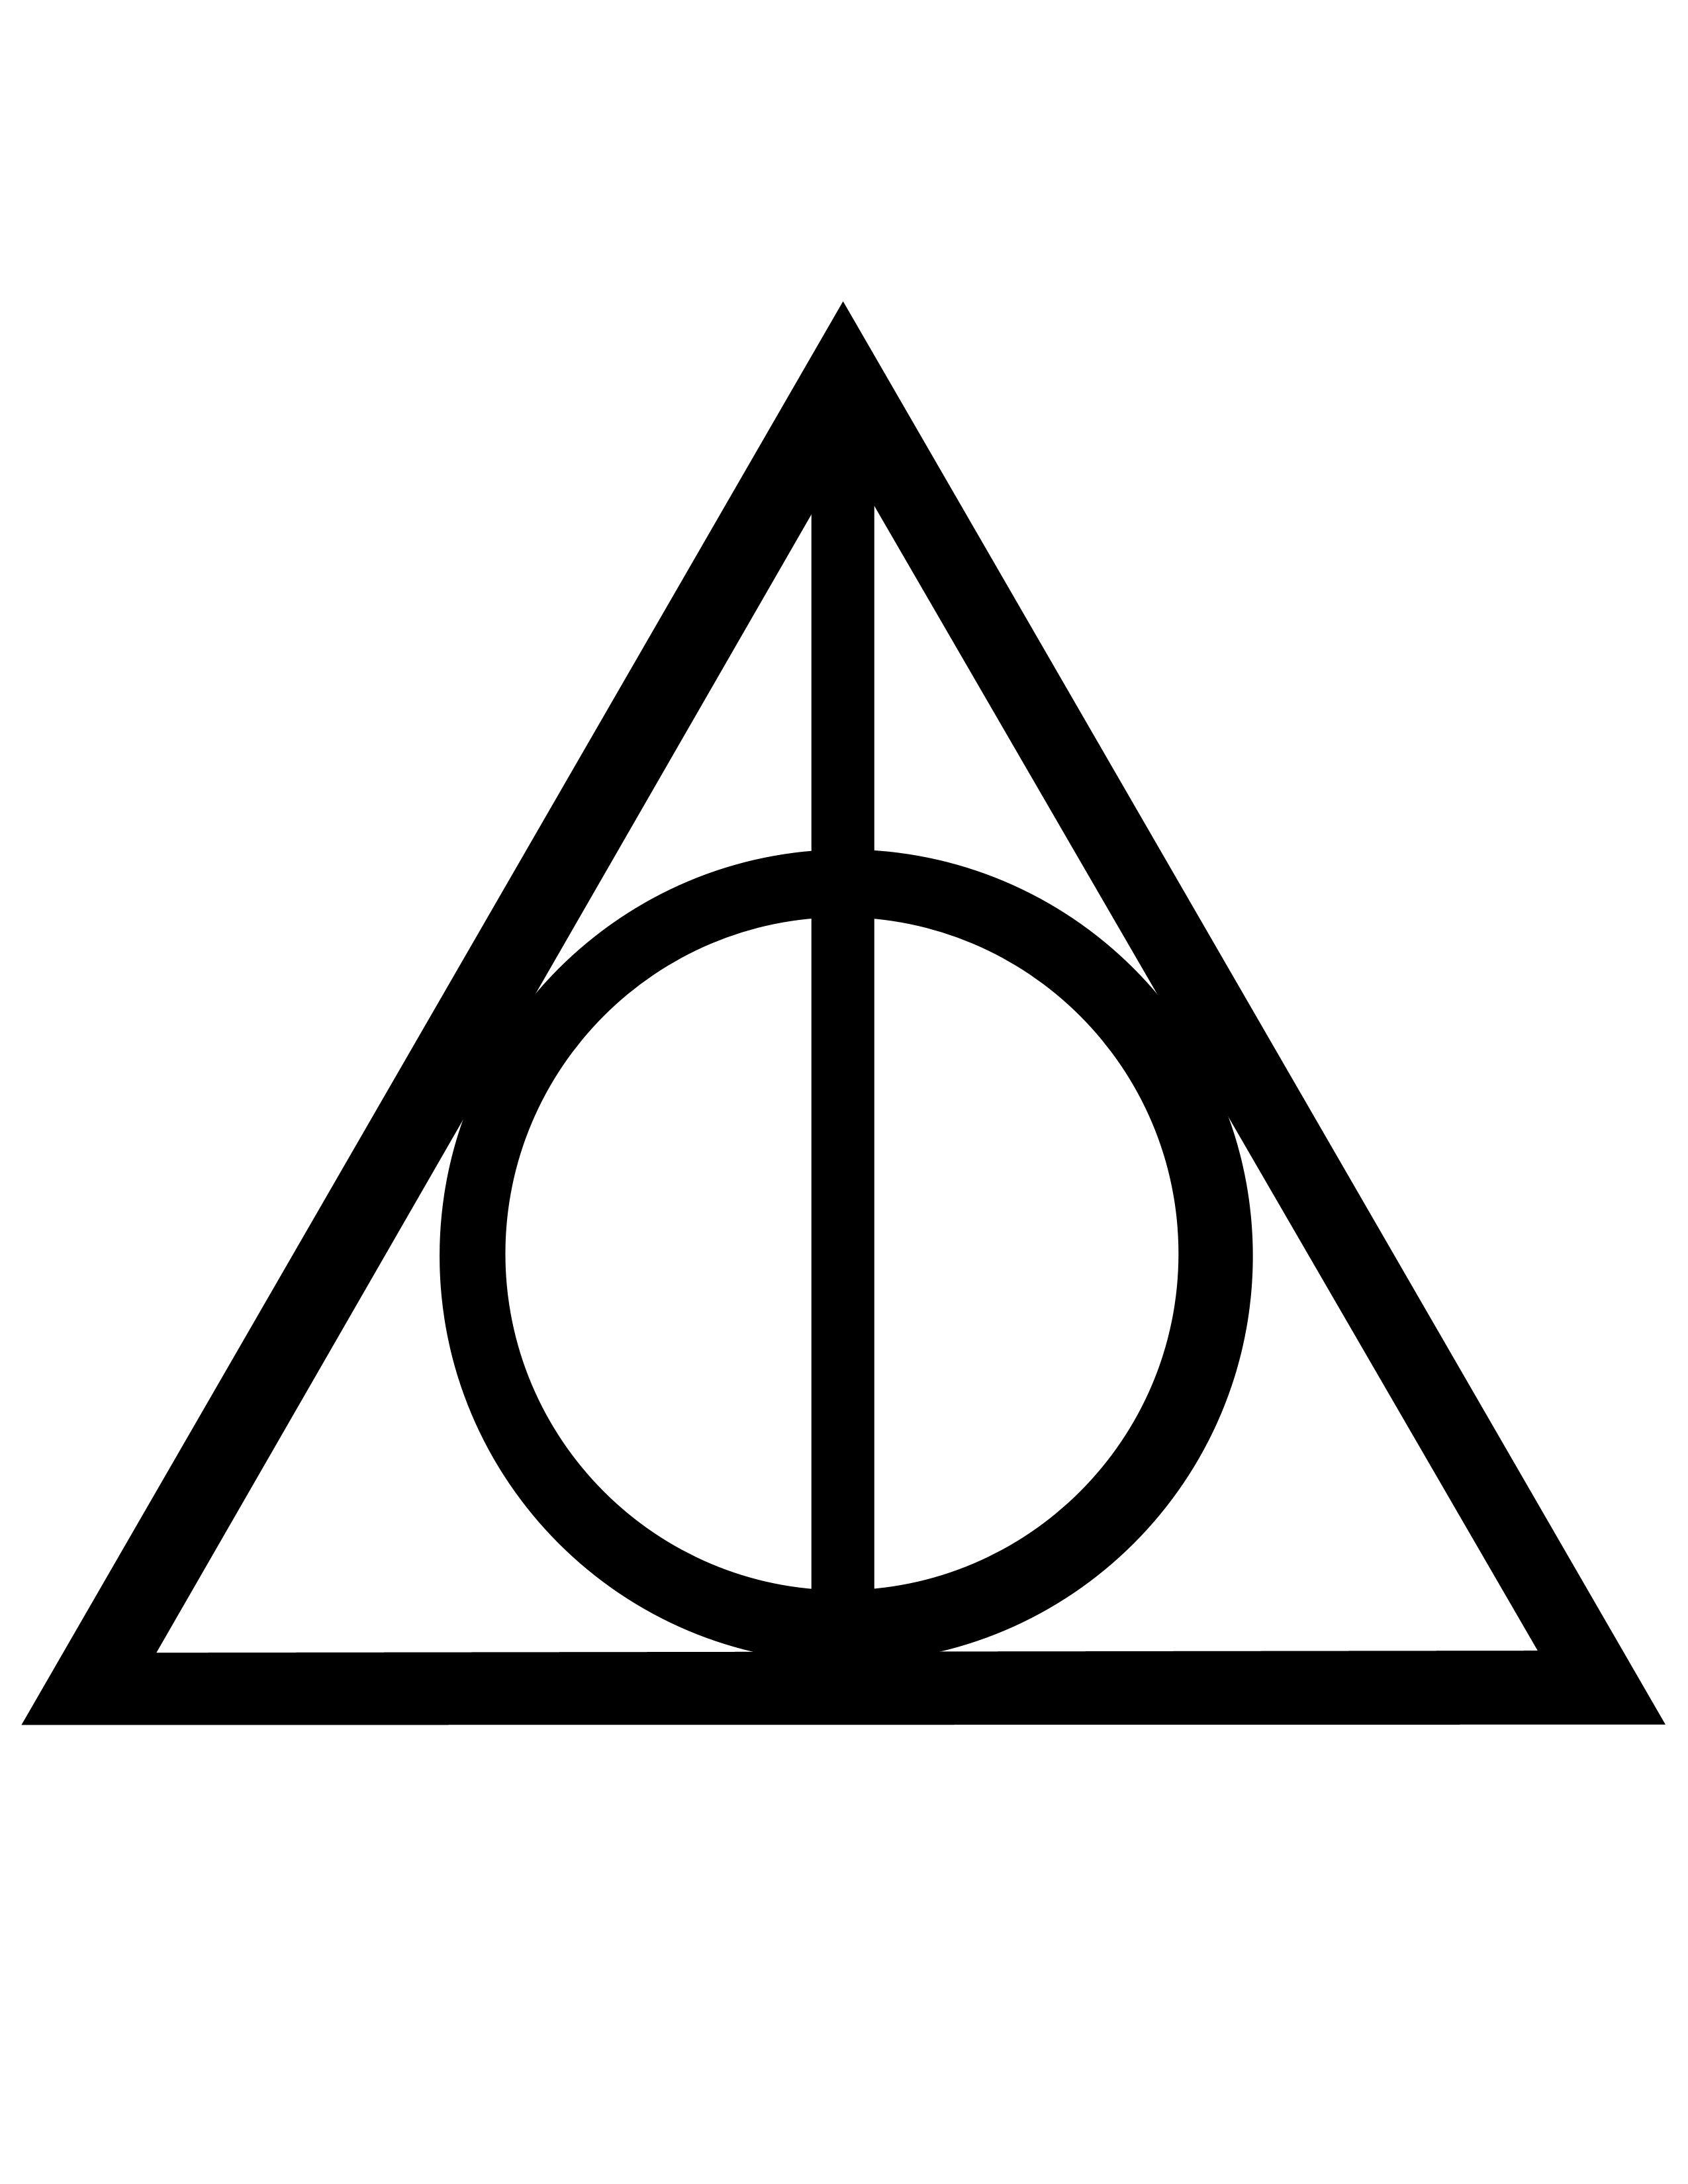 deathly hallows symbol.